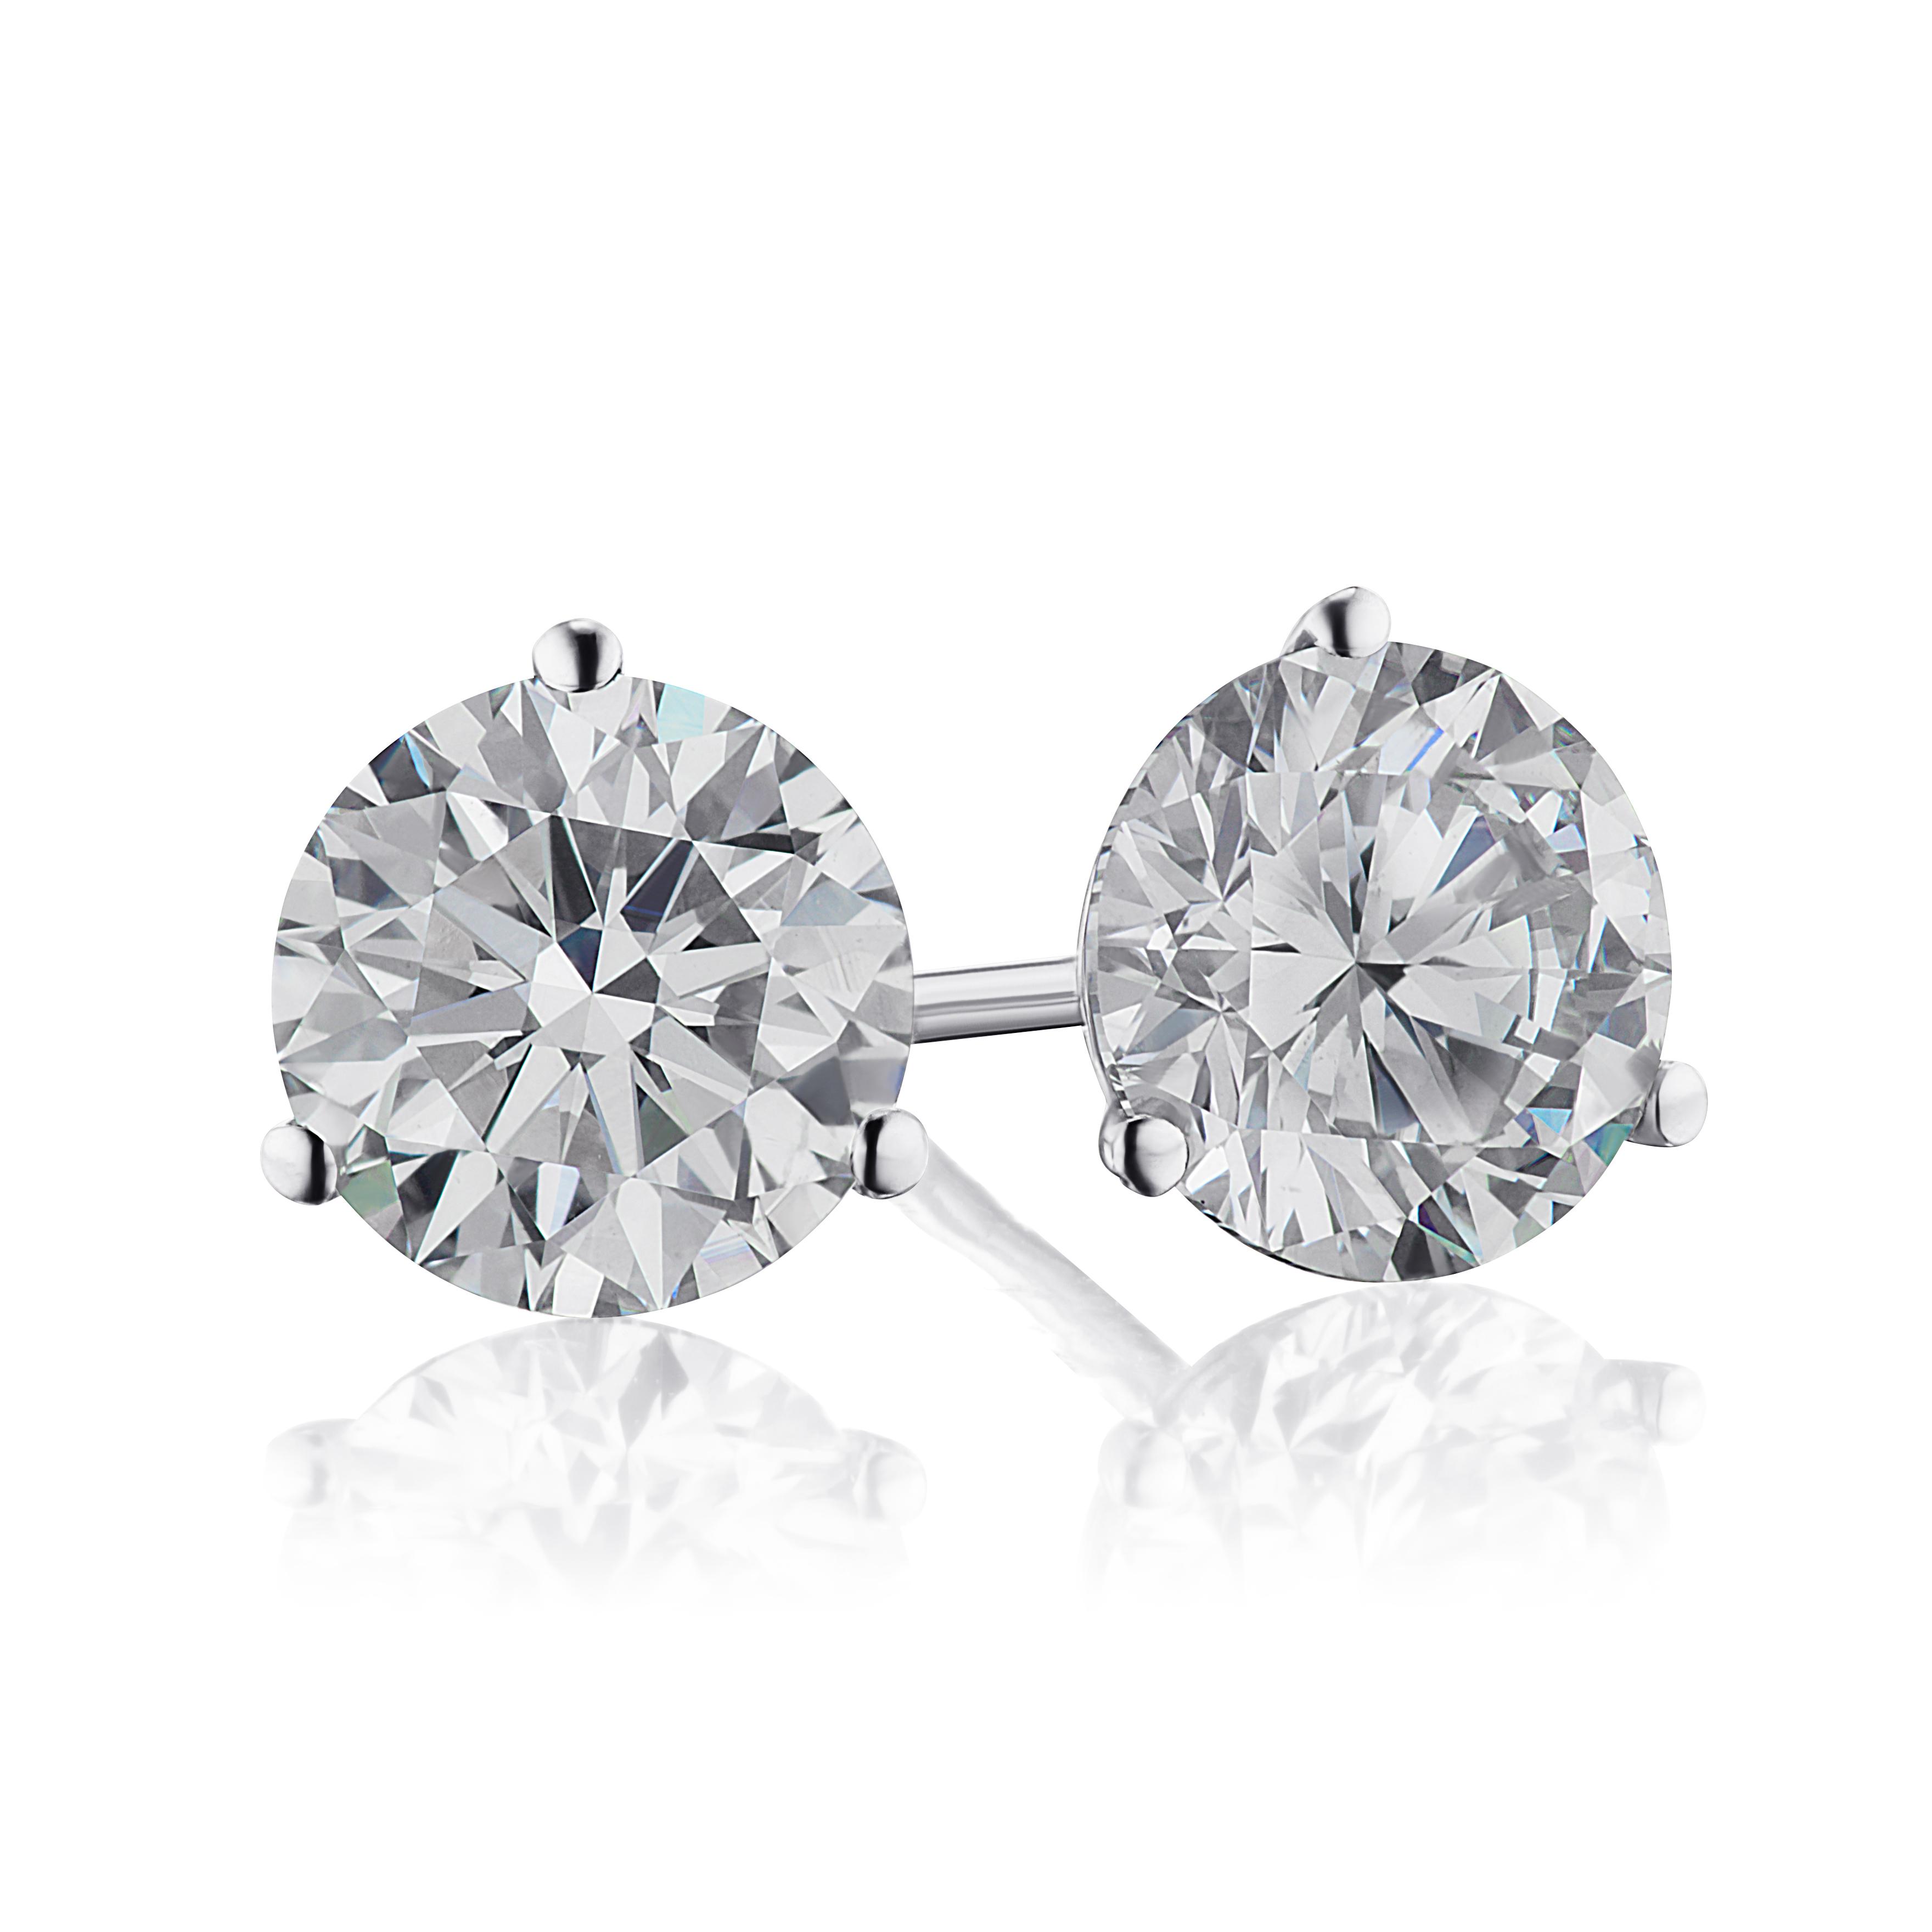 2.02ct.t.w. Diamond Studs